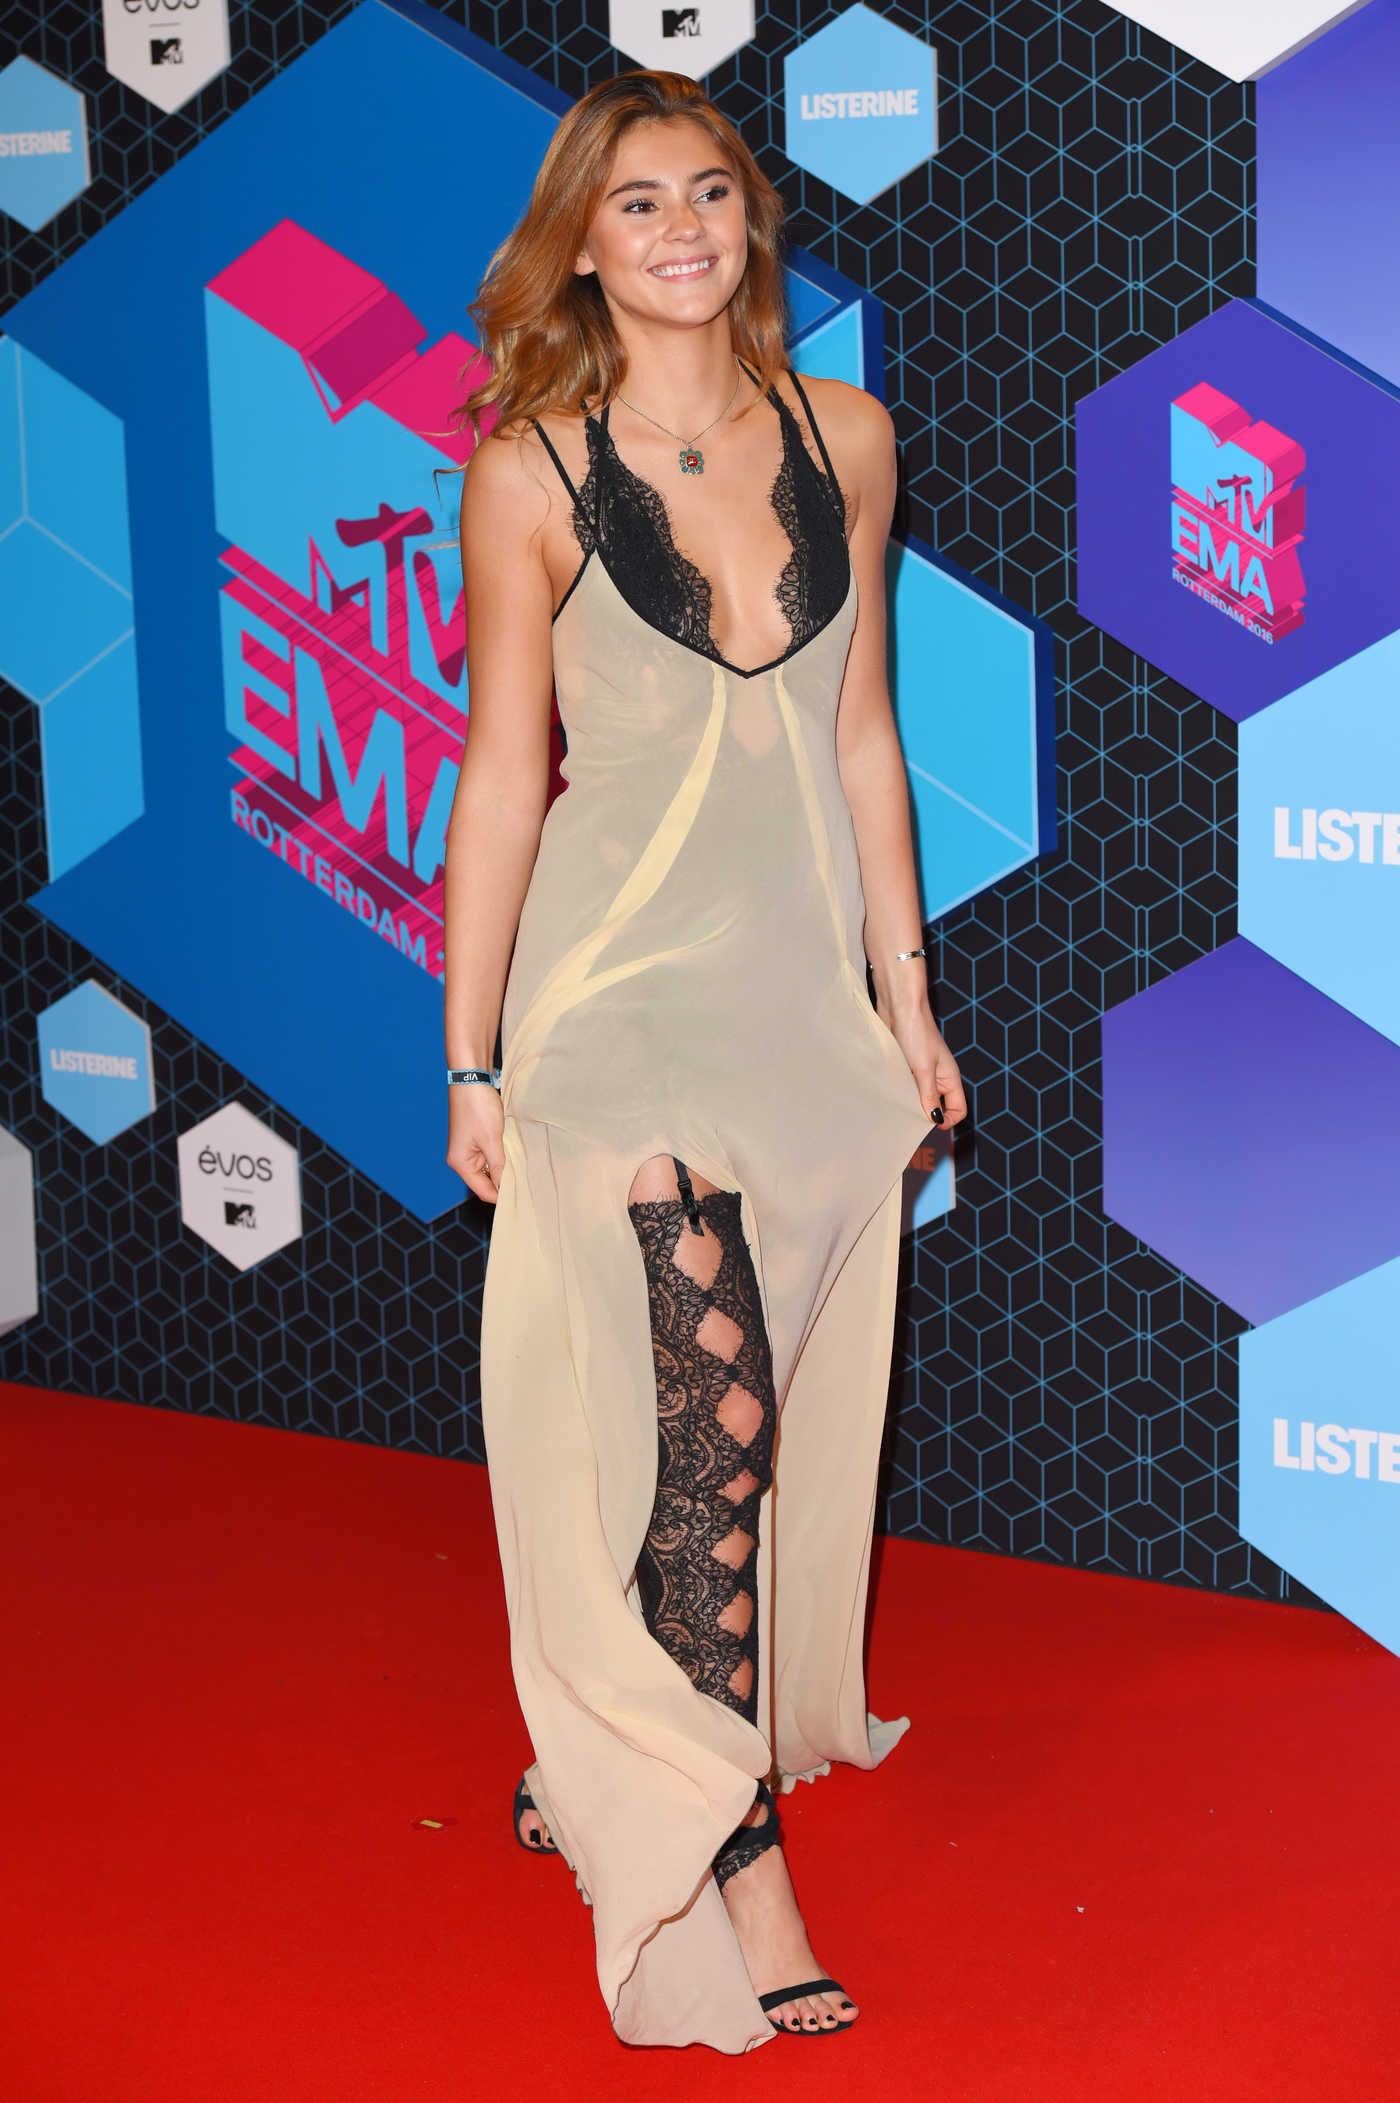 Stefanie Giesinger at the MTV Europe Music Awards in Rotterdam 11/06/2016